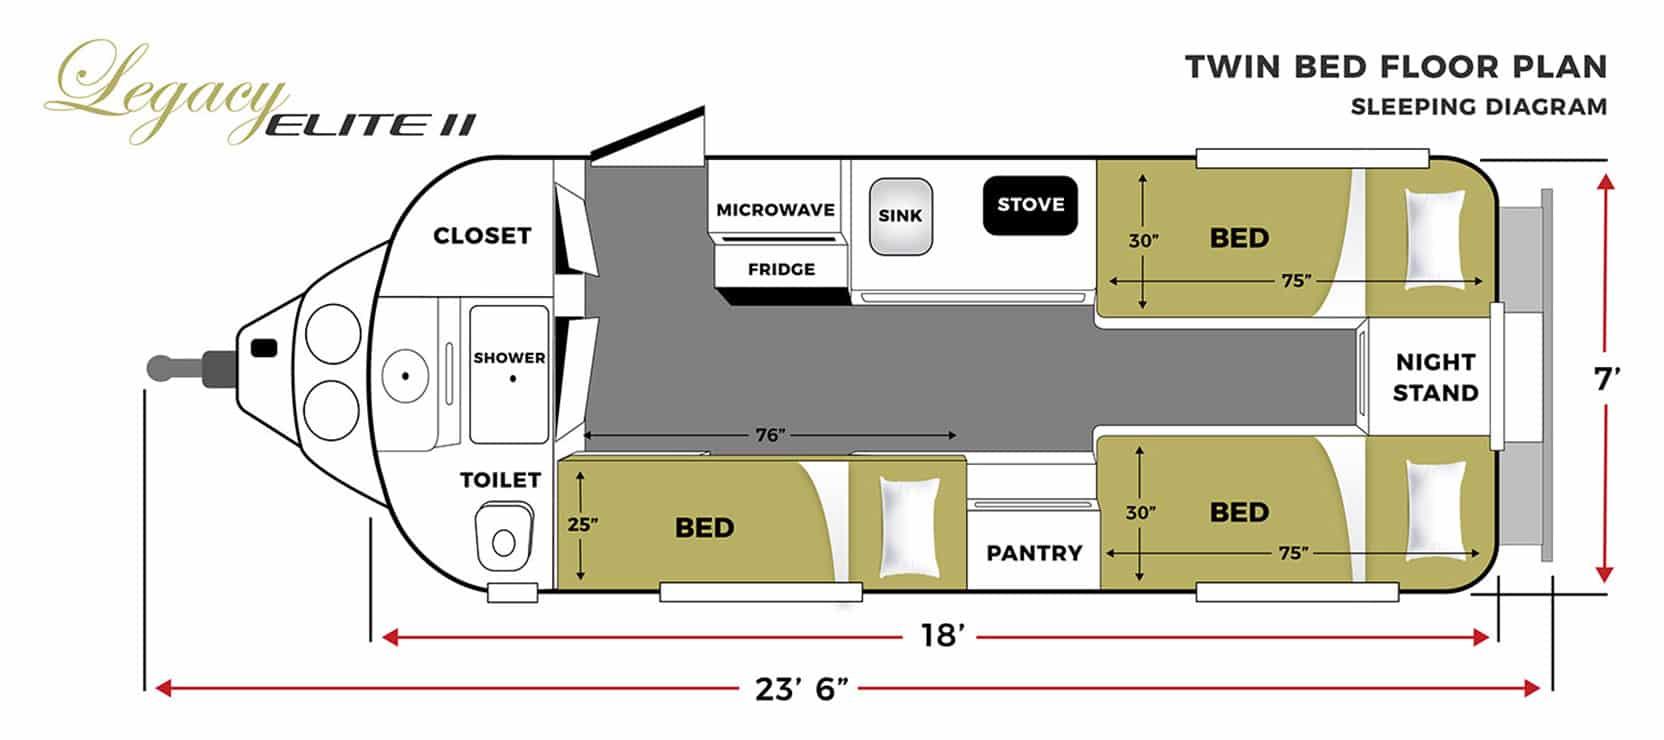 oliver travel trailers legacy elite 2 twin bed sleeping floor plan horizontal